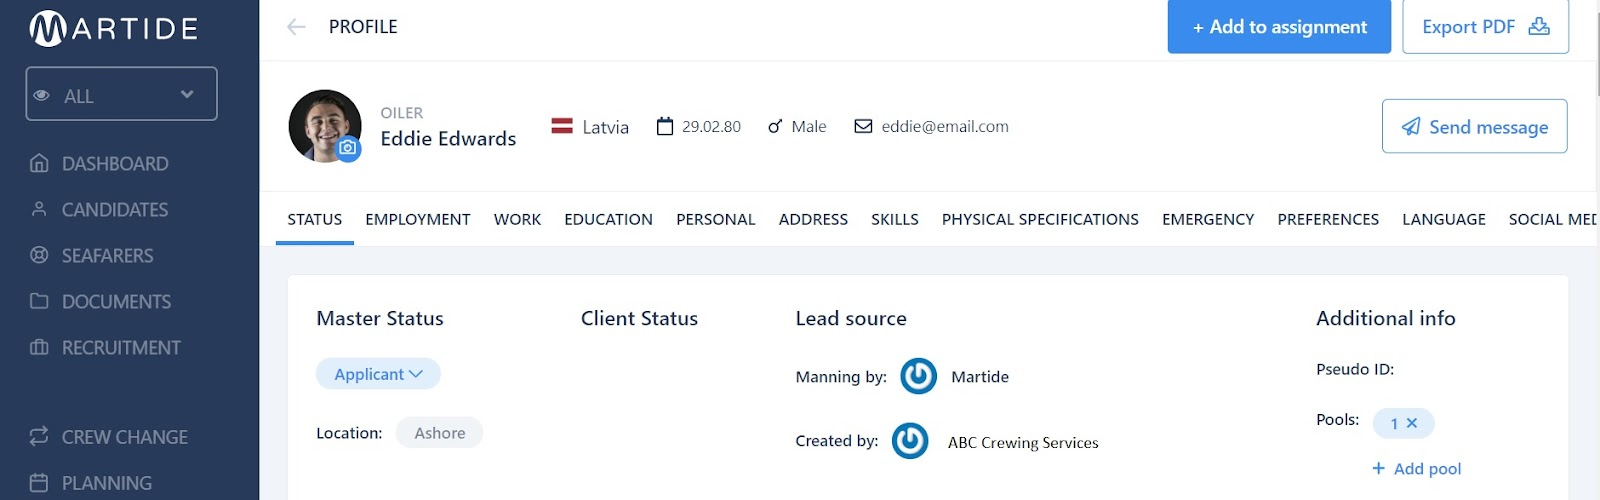 screenshot of Martide website showing a candidate's seafarer profile